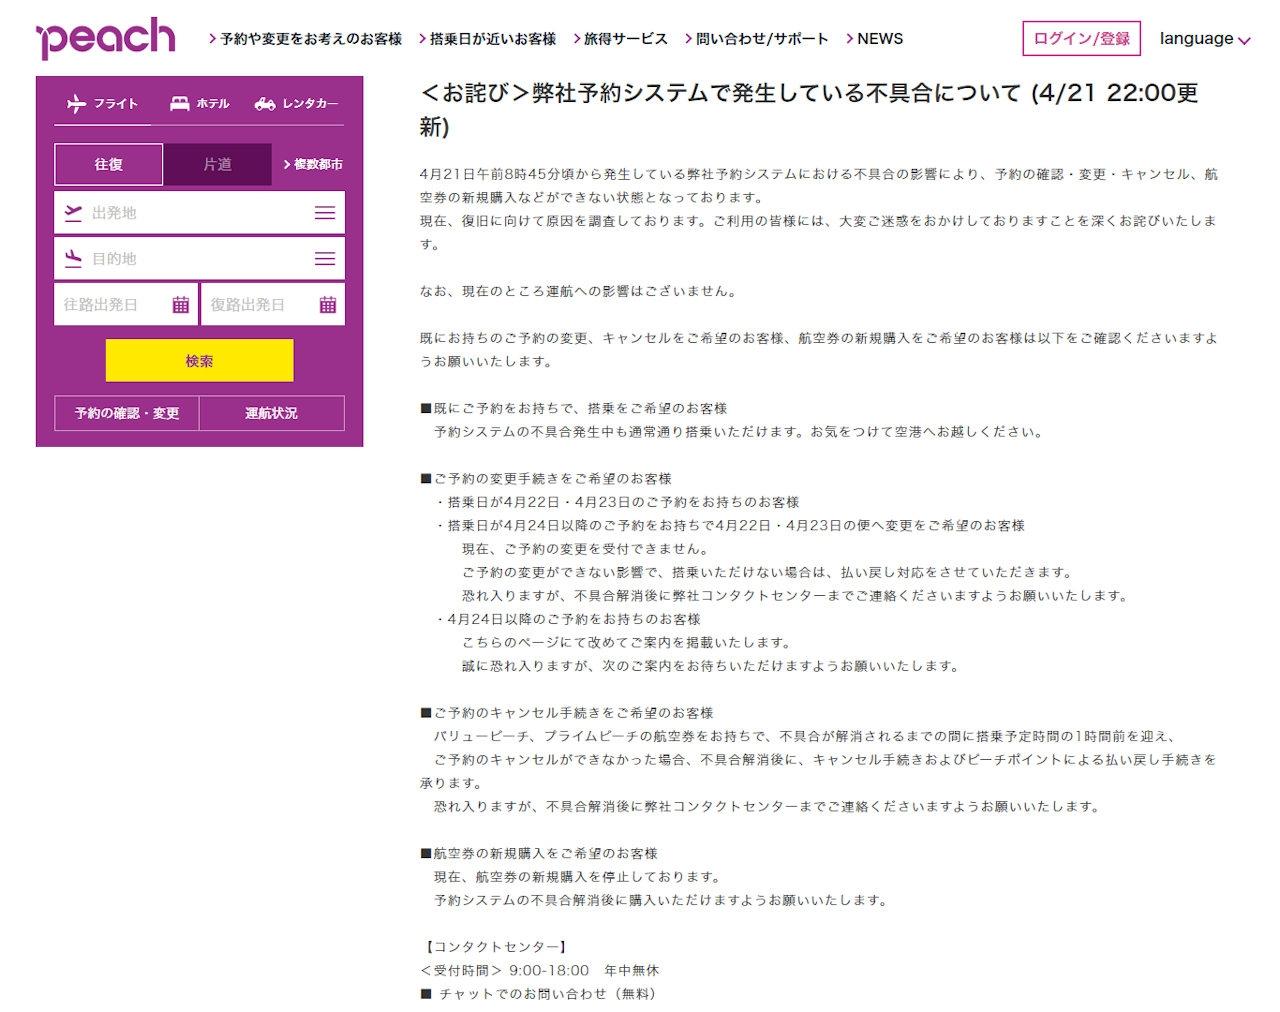 Peach Aviation(ピーチ)が掲出したシステム障害の告知 (出所:Peach Aviation)